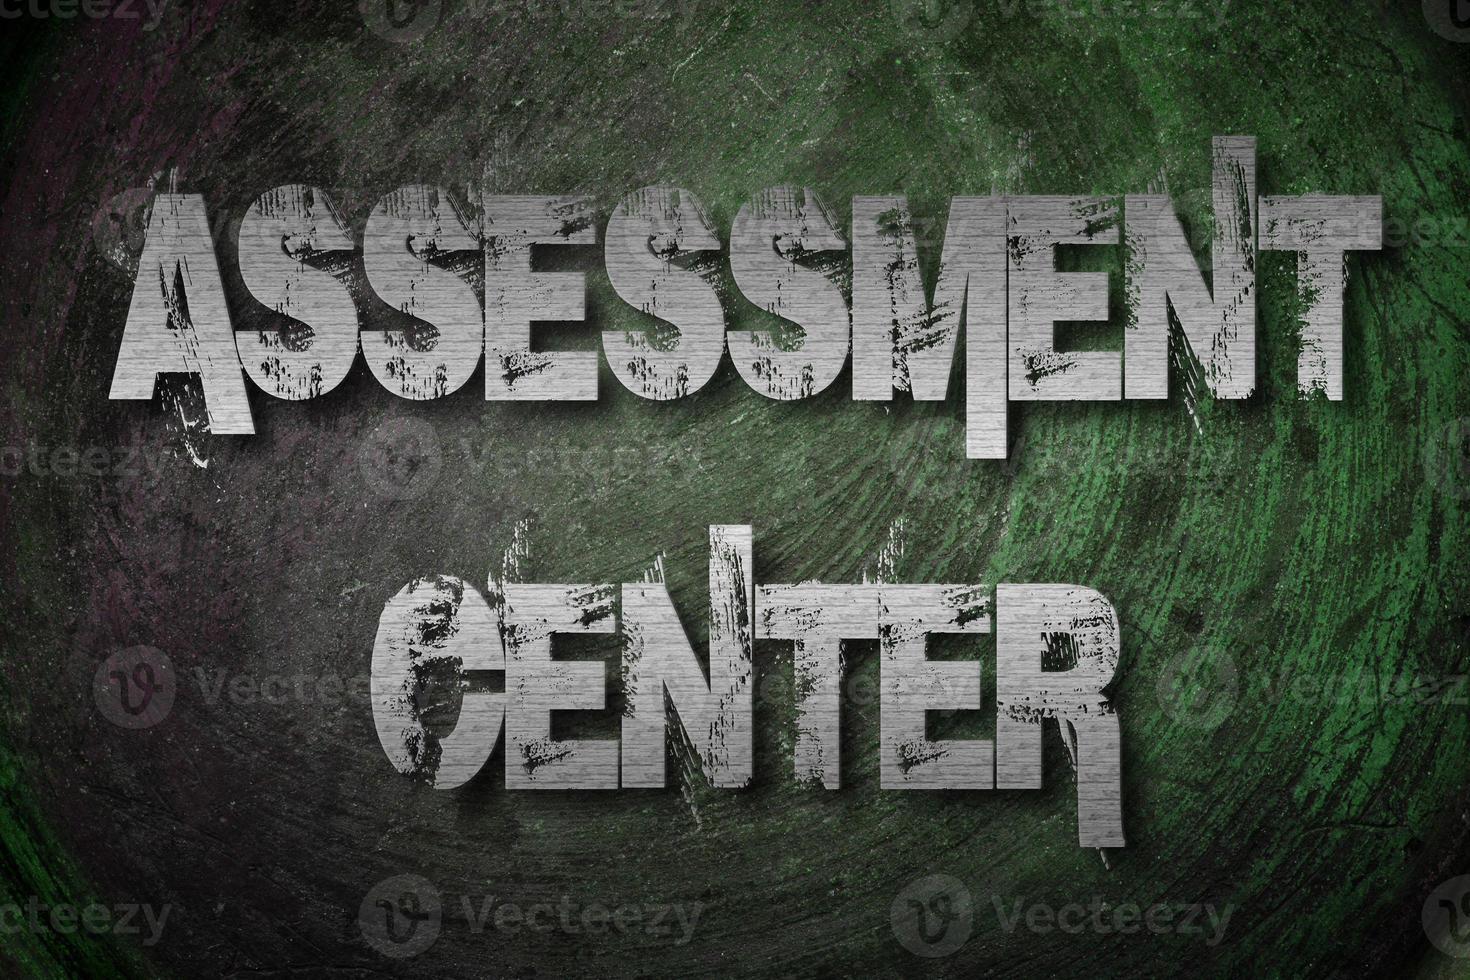 Assessment Center Concept photo